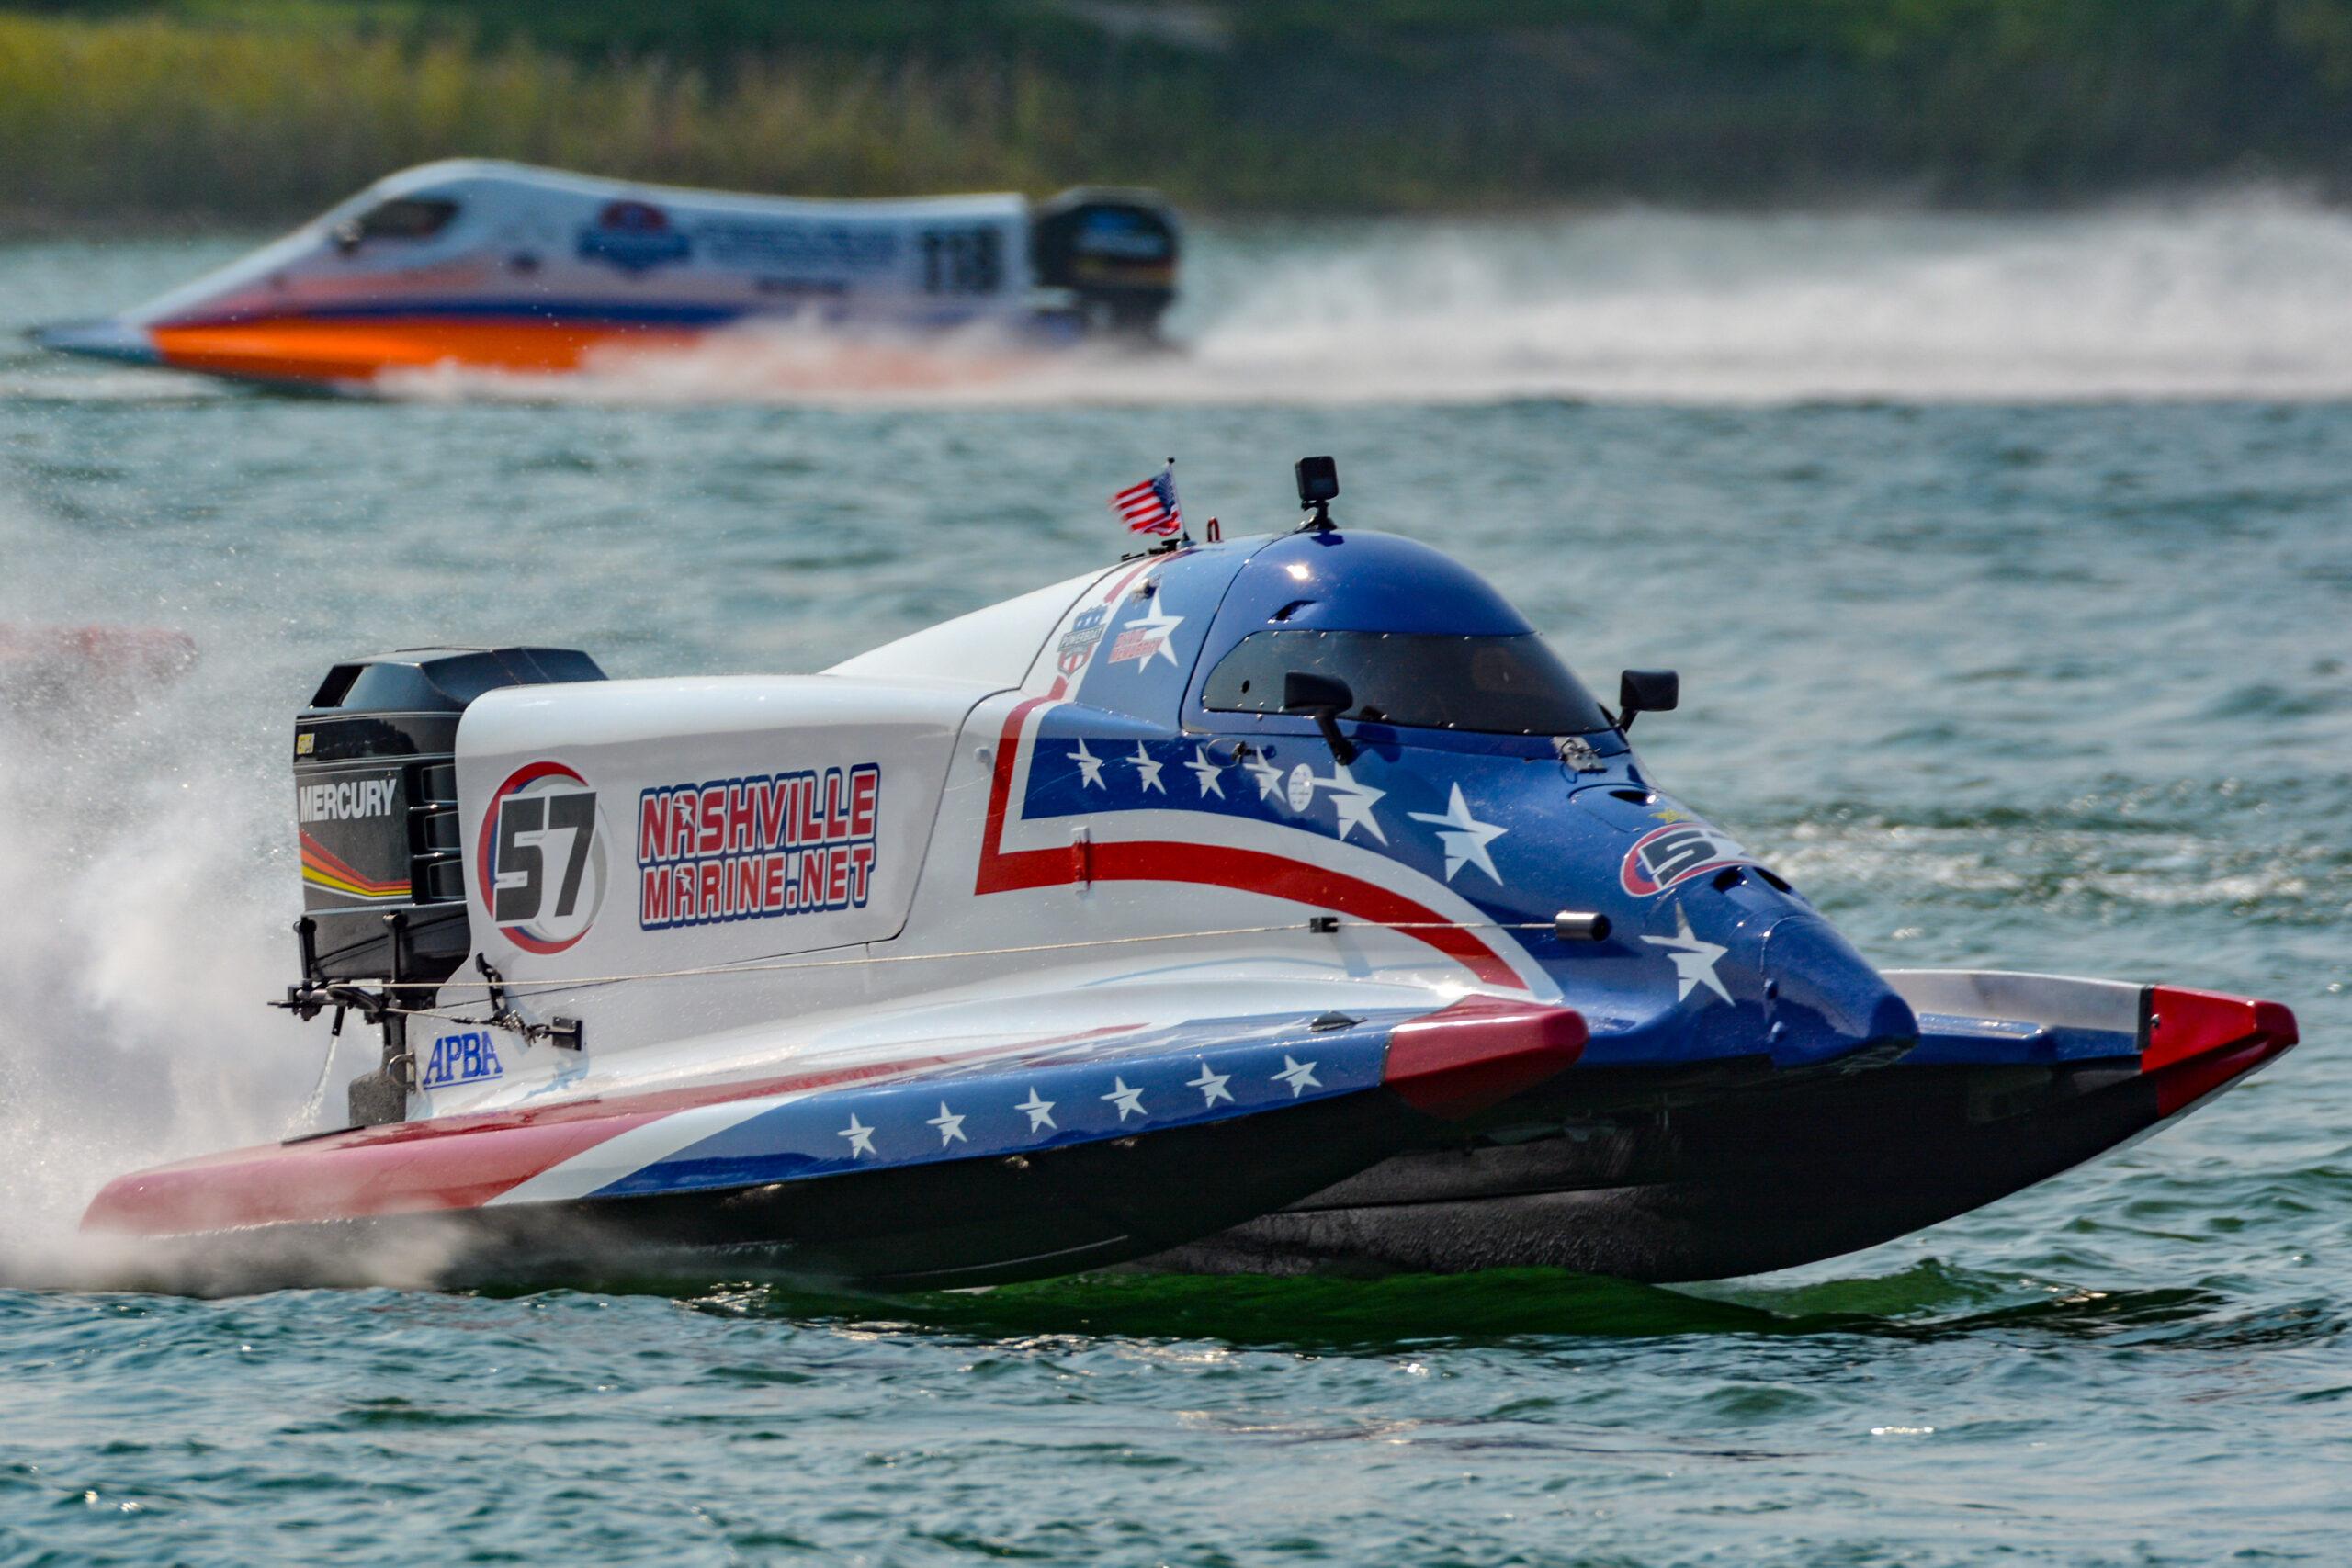 McMurray Racing Nashville Marine 2021 Springfield F1 Race-66